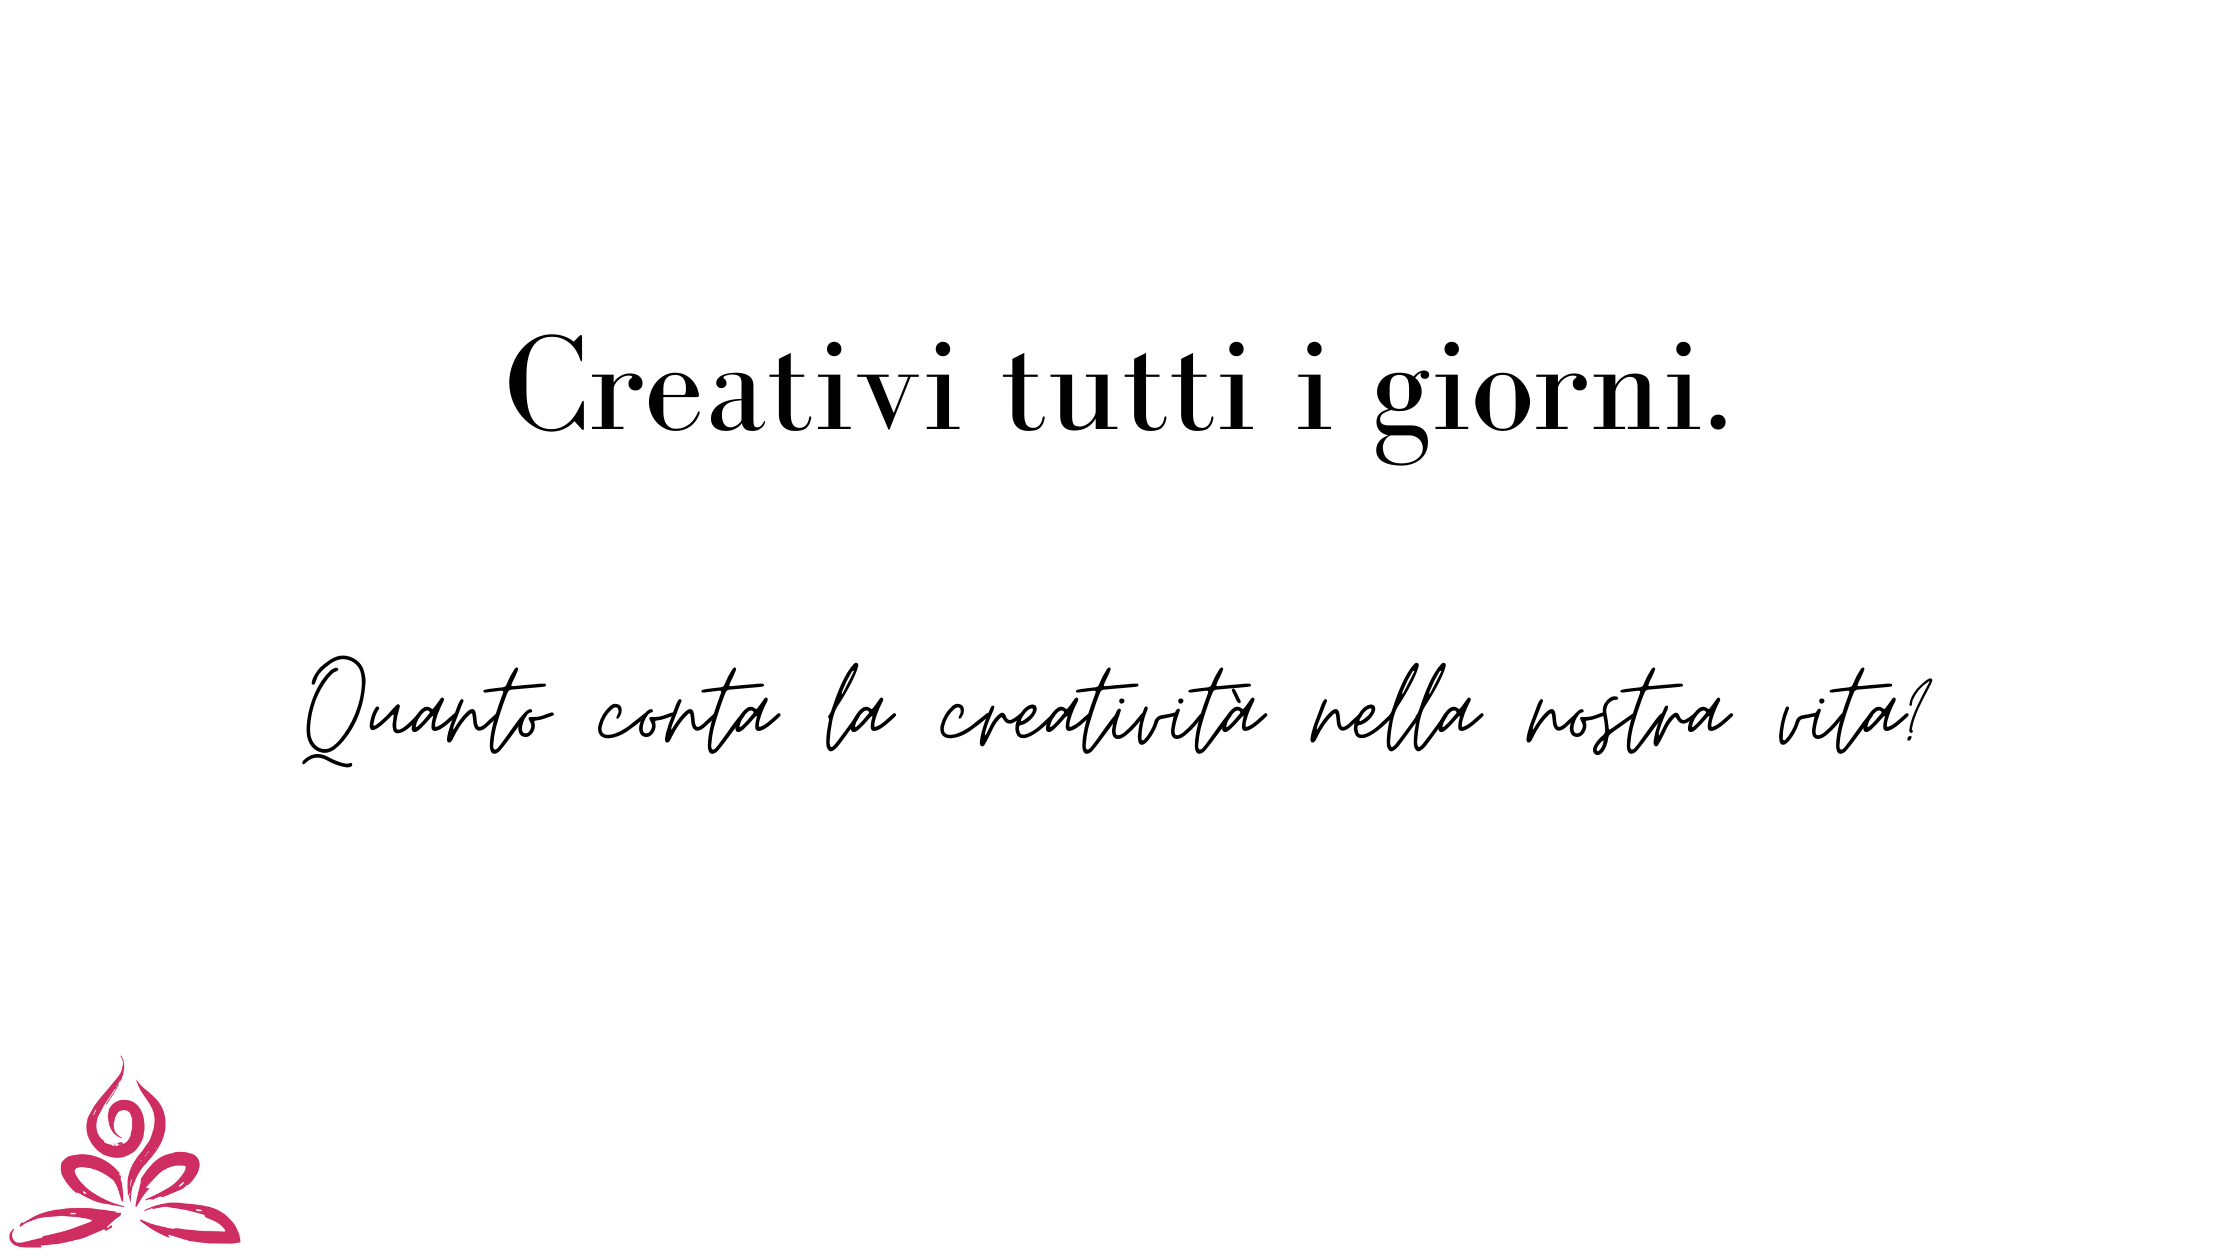 Federica Piacentini, Editor, Coaching